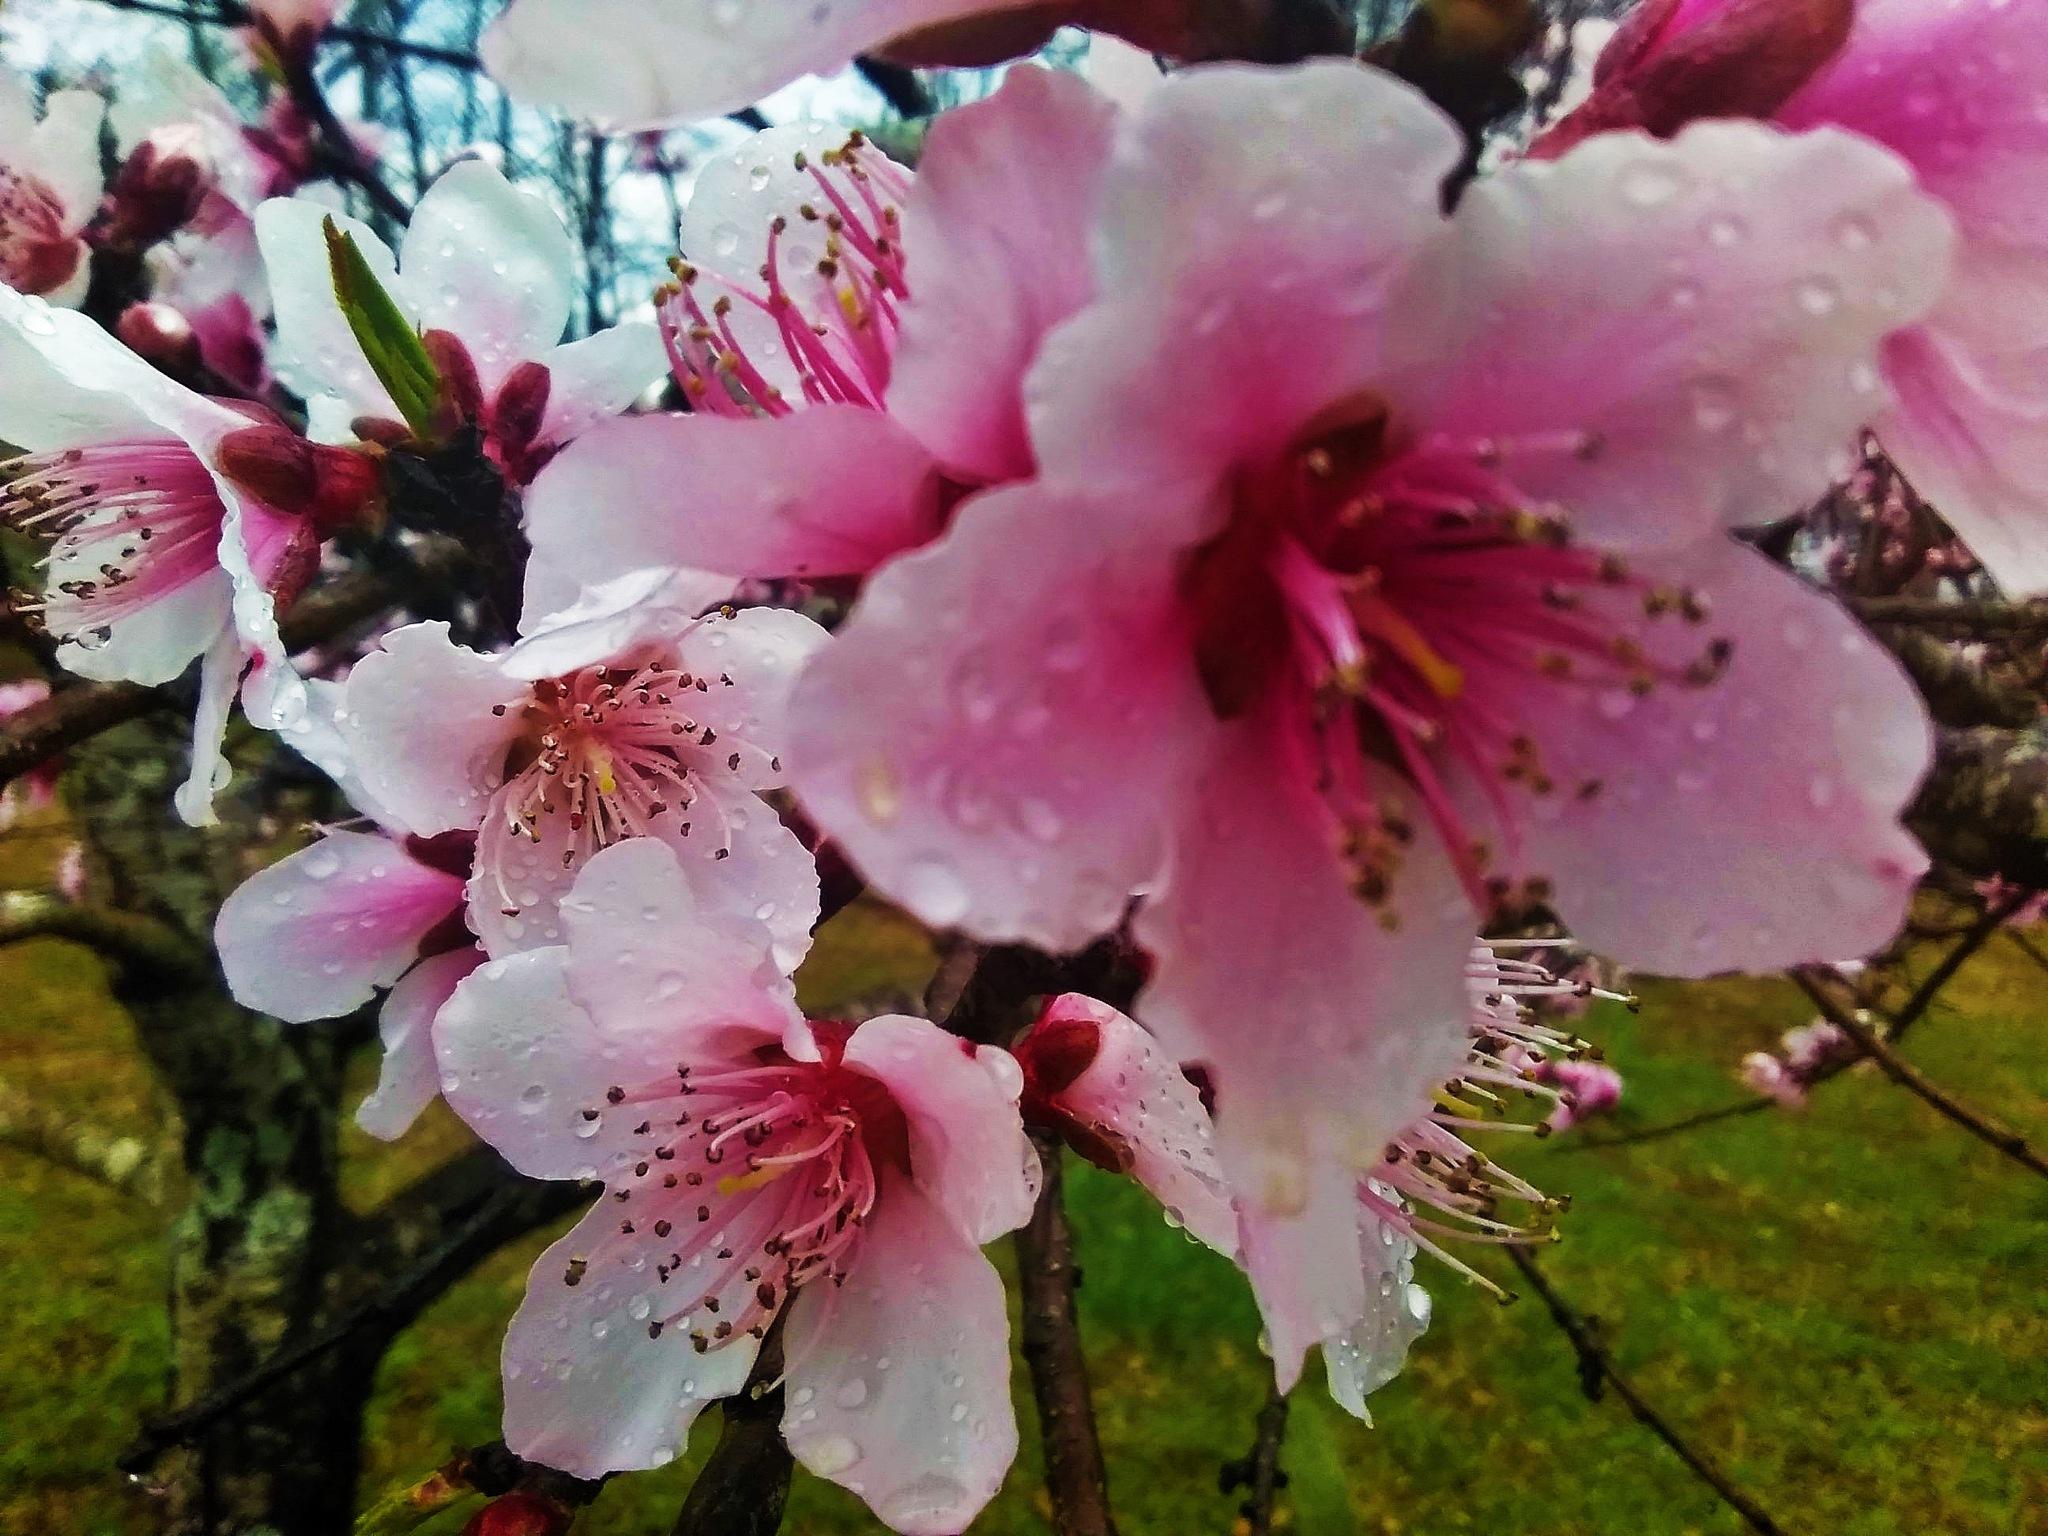 Peach Blossoms by Julie Piwaron